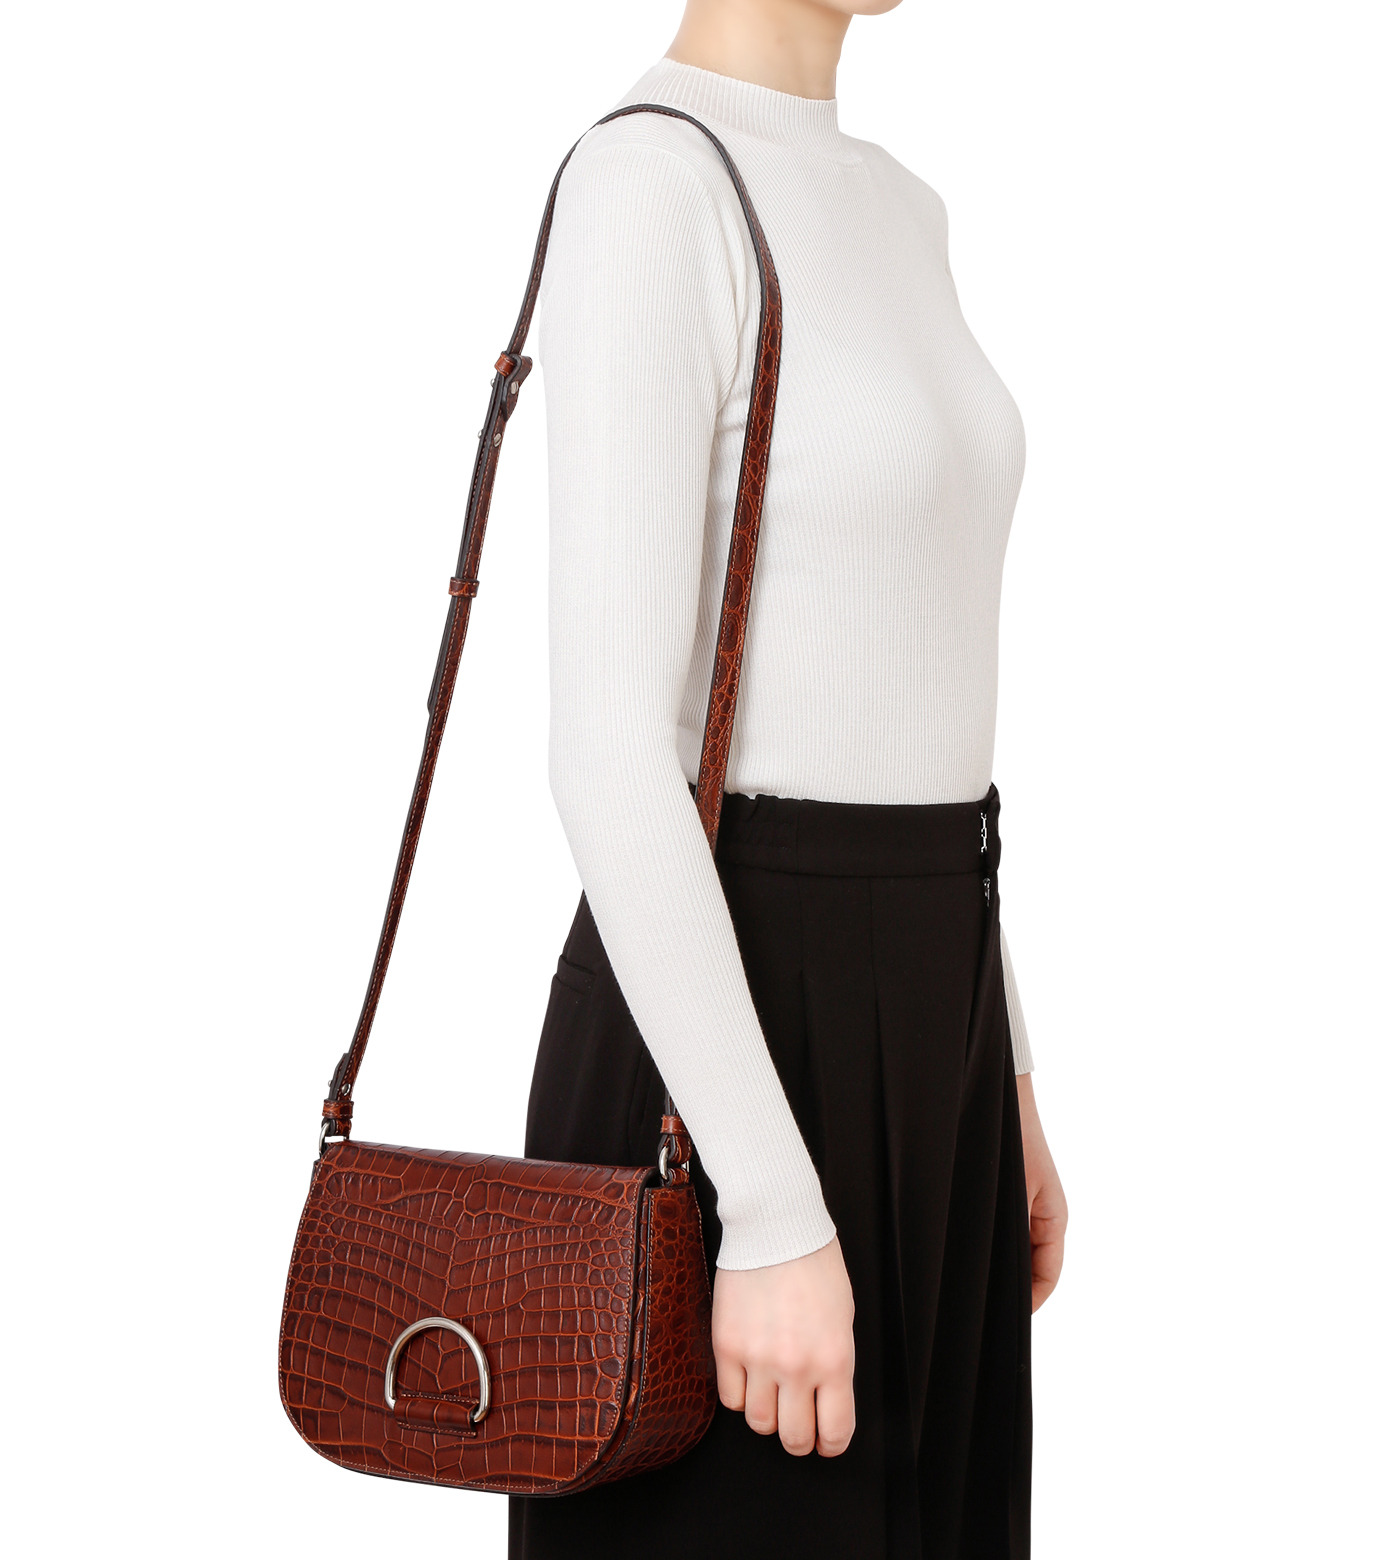 Little Liffner(リトル リフナー)のSaddleStyle D-ring-DARK BROWN(ショルダーバッグ/shoulder bag)-CR2784-53 拡大詳細画像5